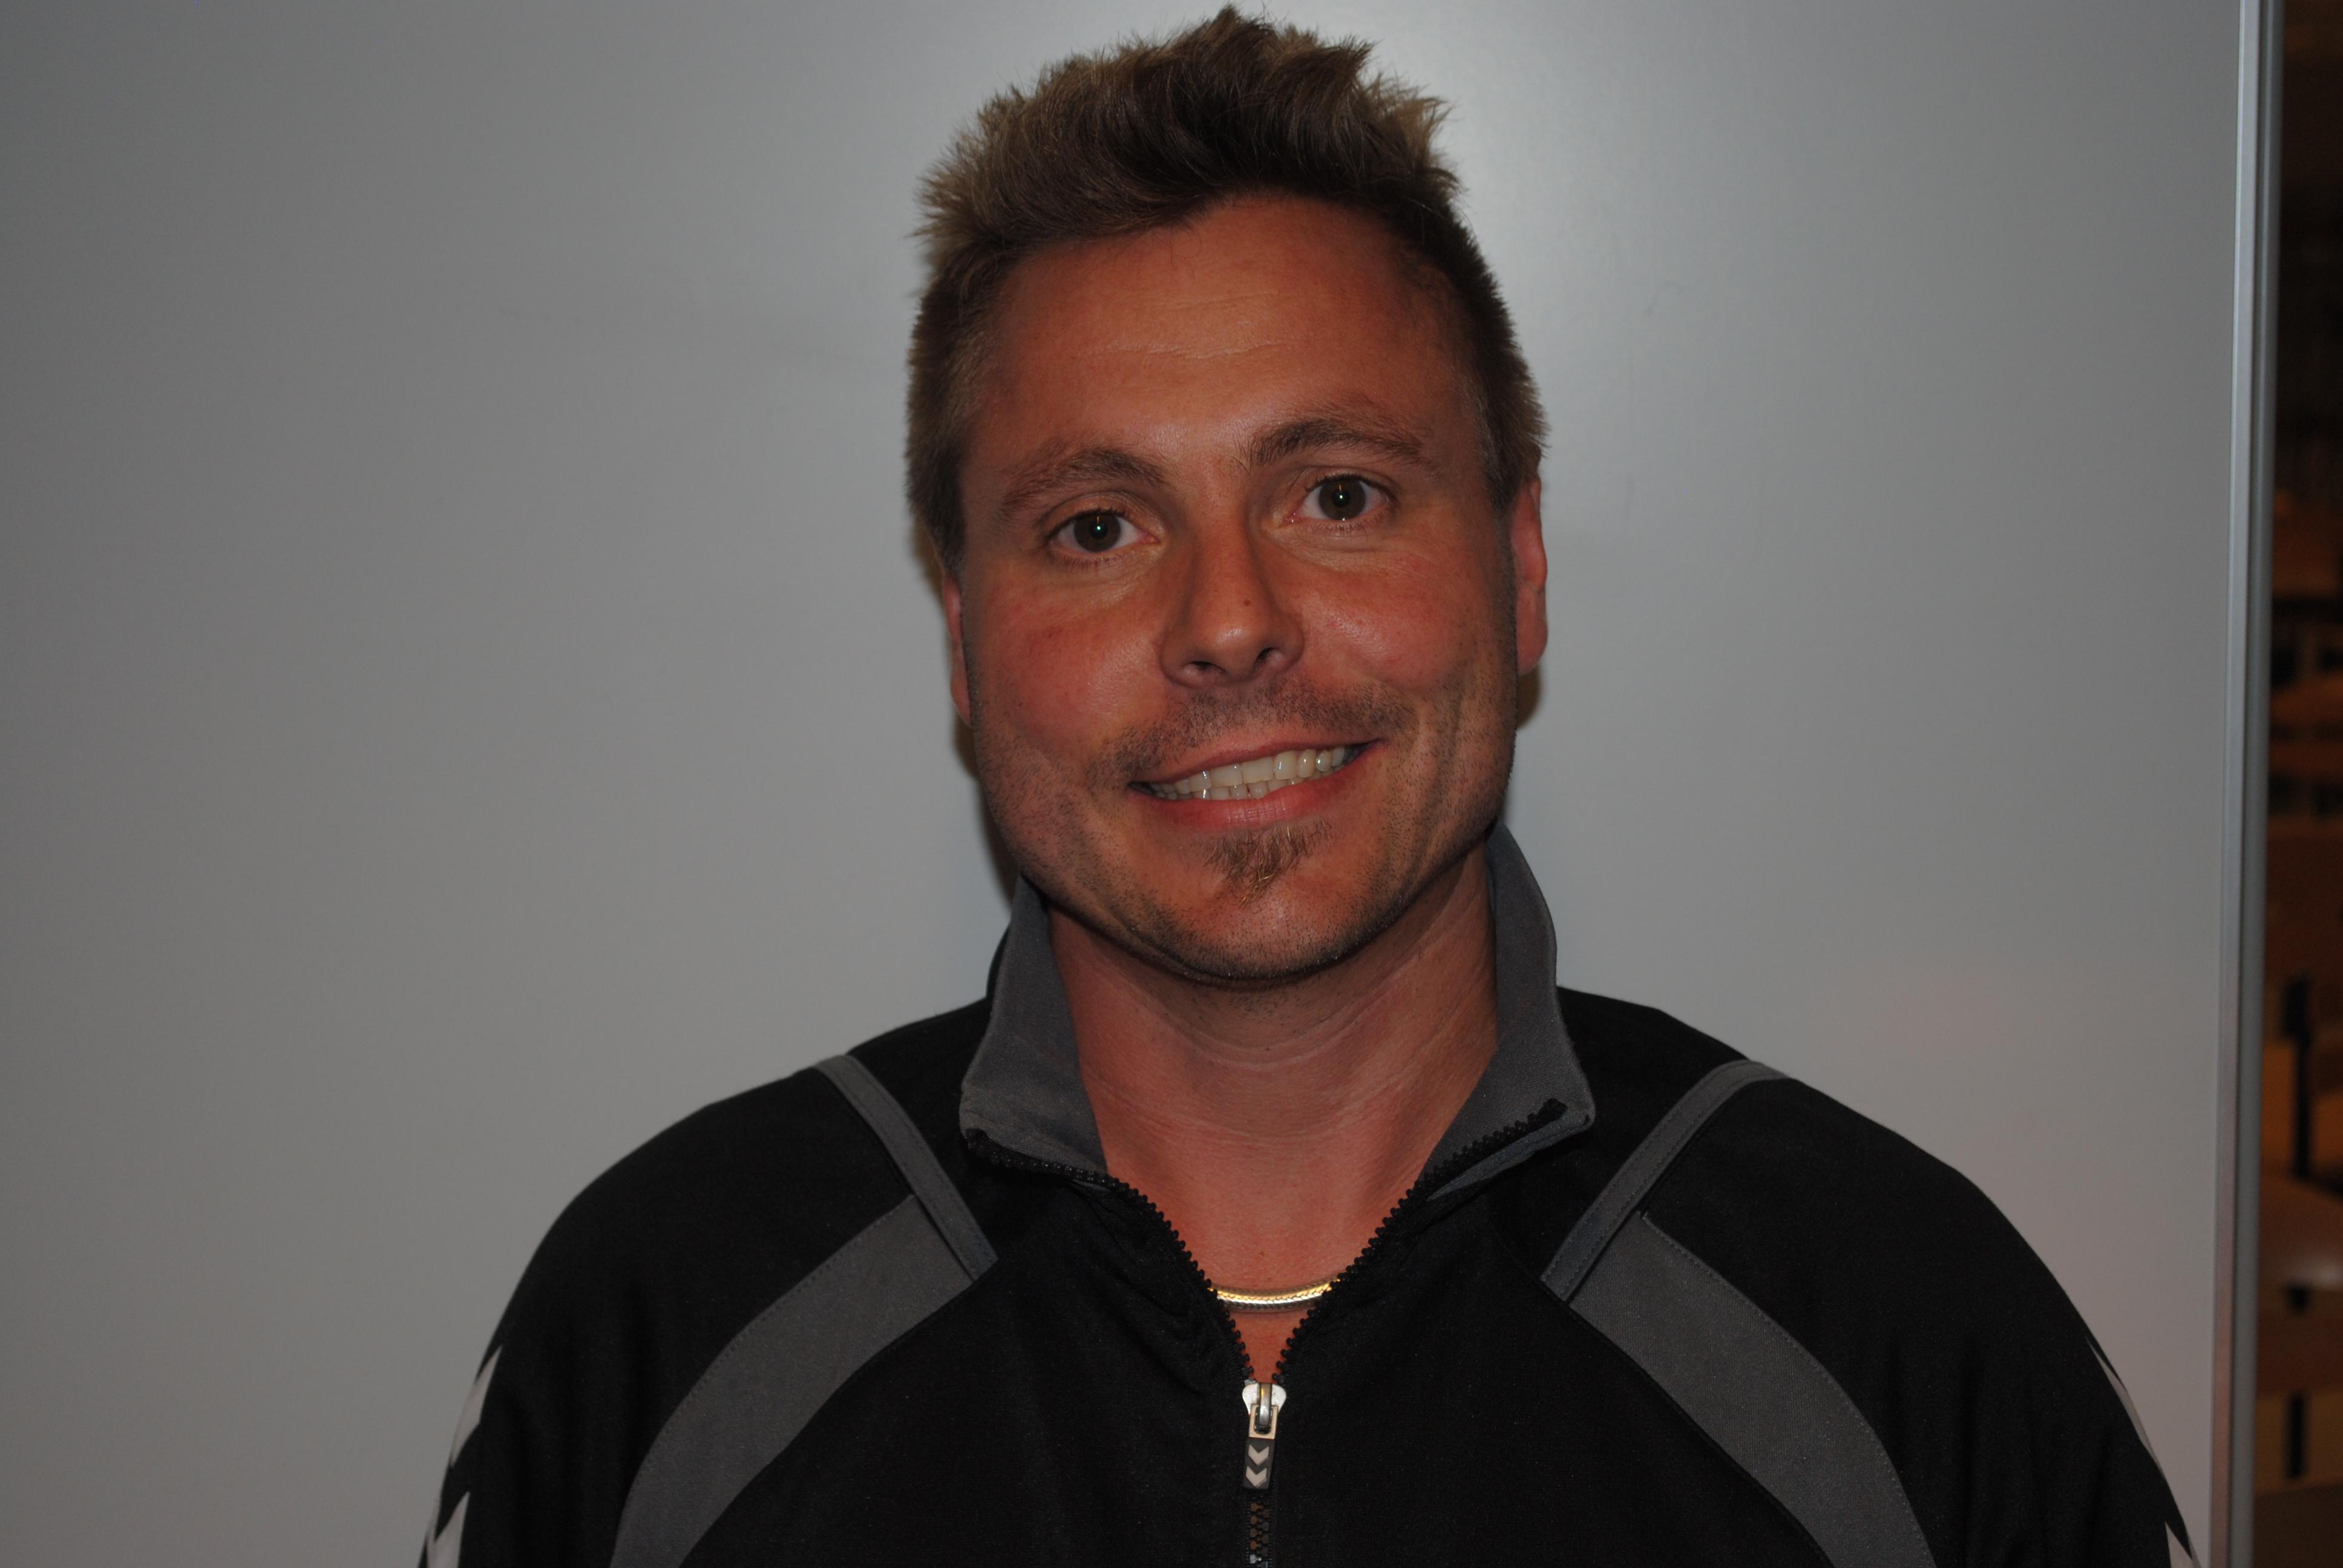 Rasmus Køster